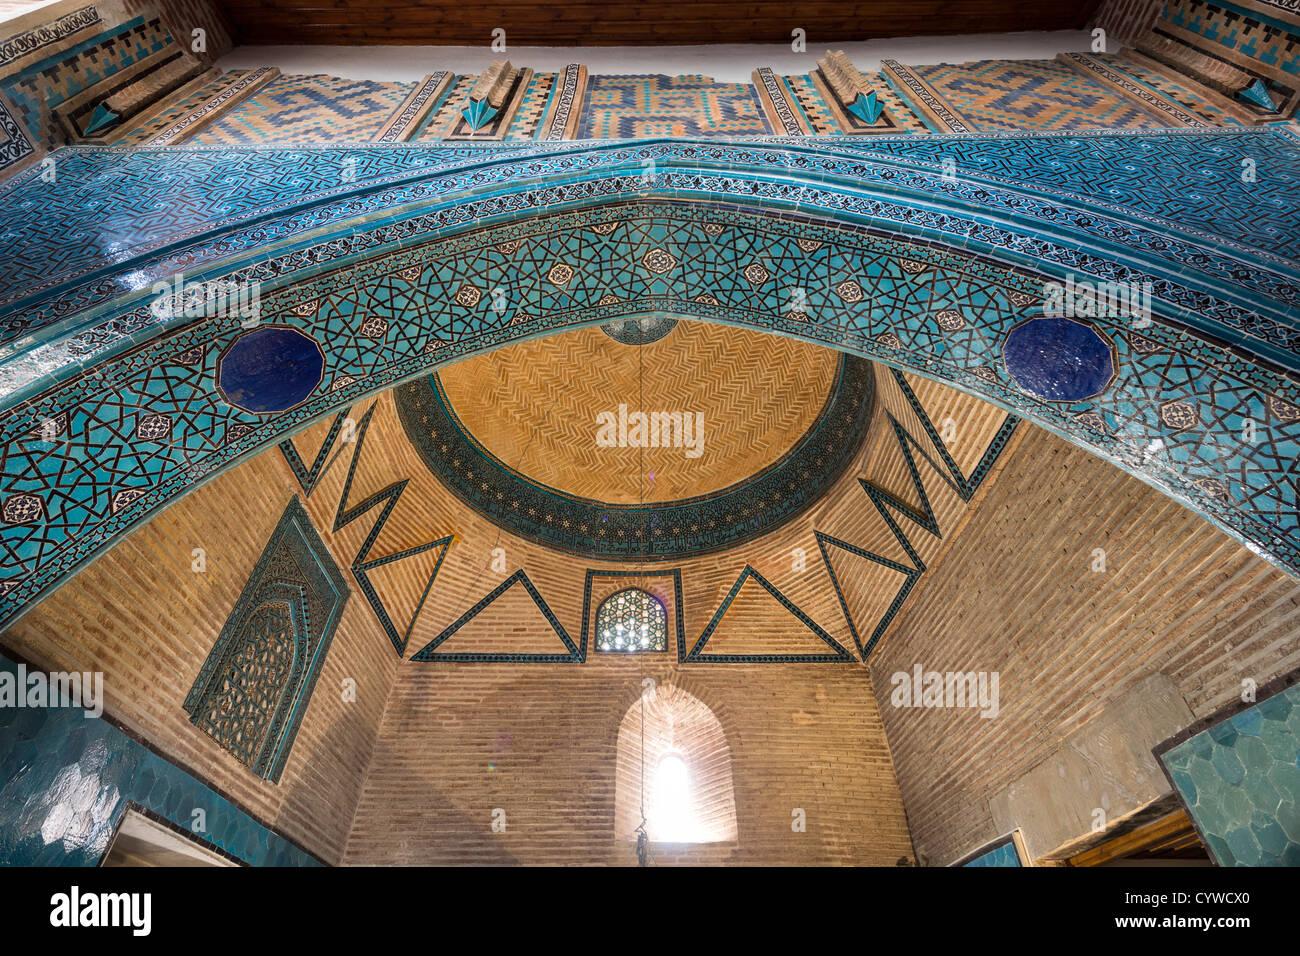 arch and dome of mausoleum, Sahib Ata complex, Konya, Turkey - Stock Image